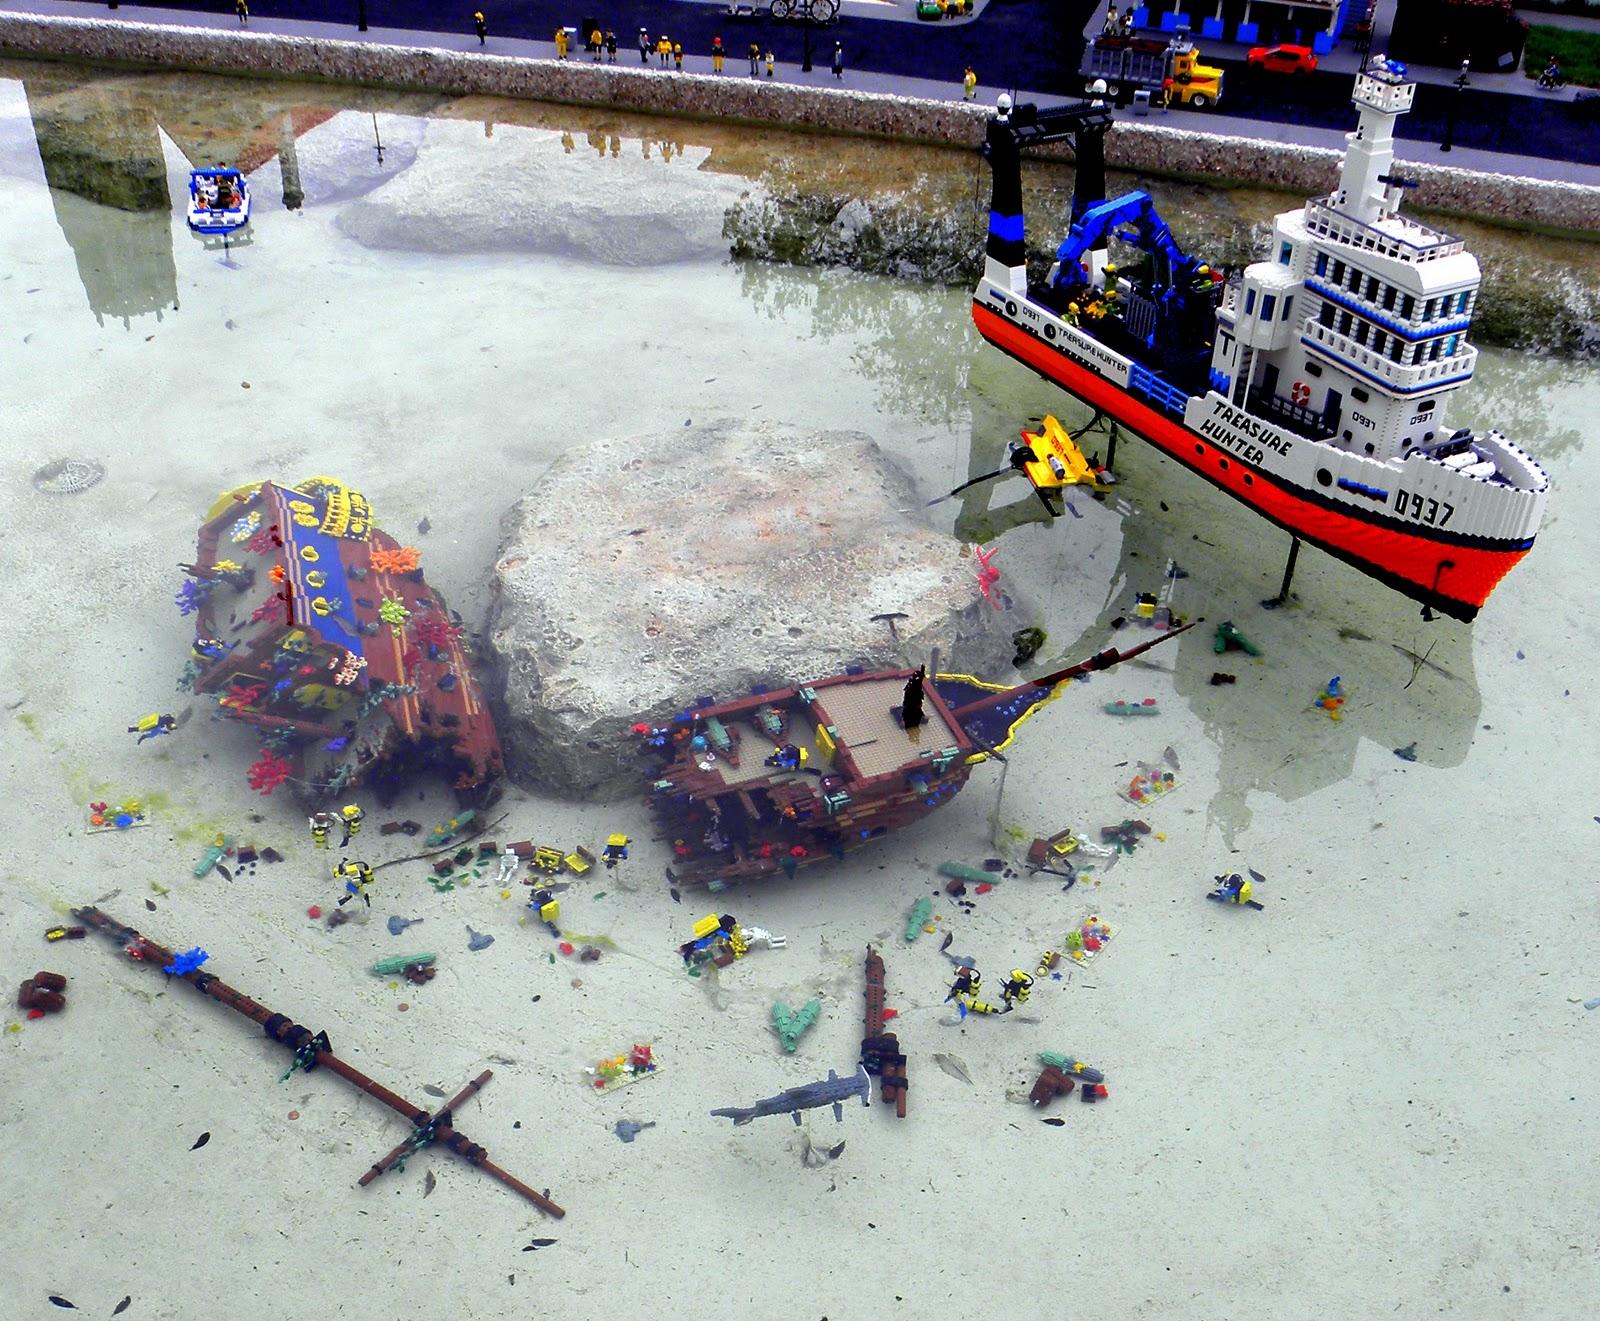 lego+shipwreck%252C+lego+sharks%252C+lego+divers%252C+lego+reef%252C+lego+ship%252C+legoland.jpg